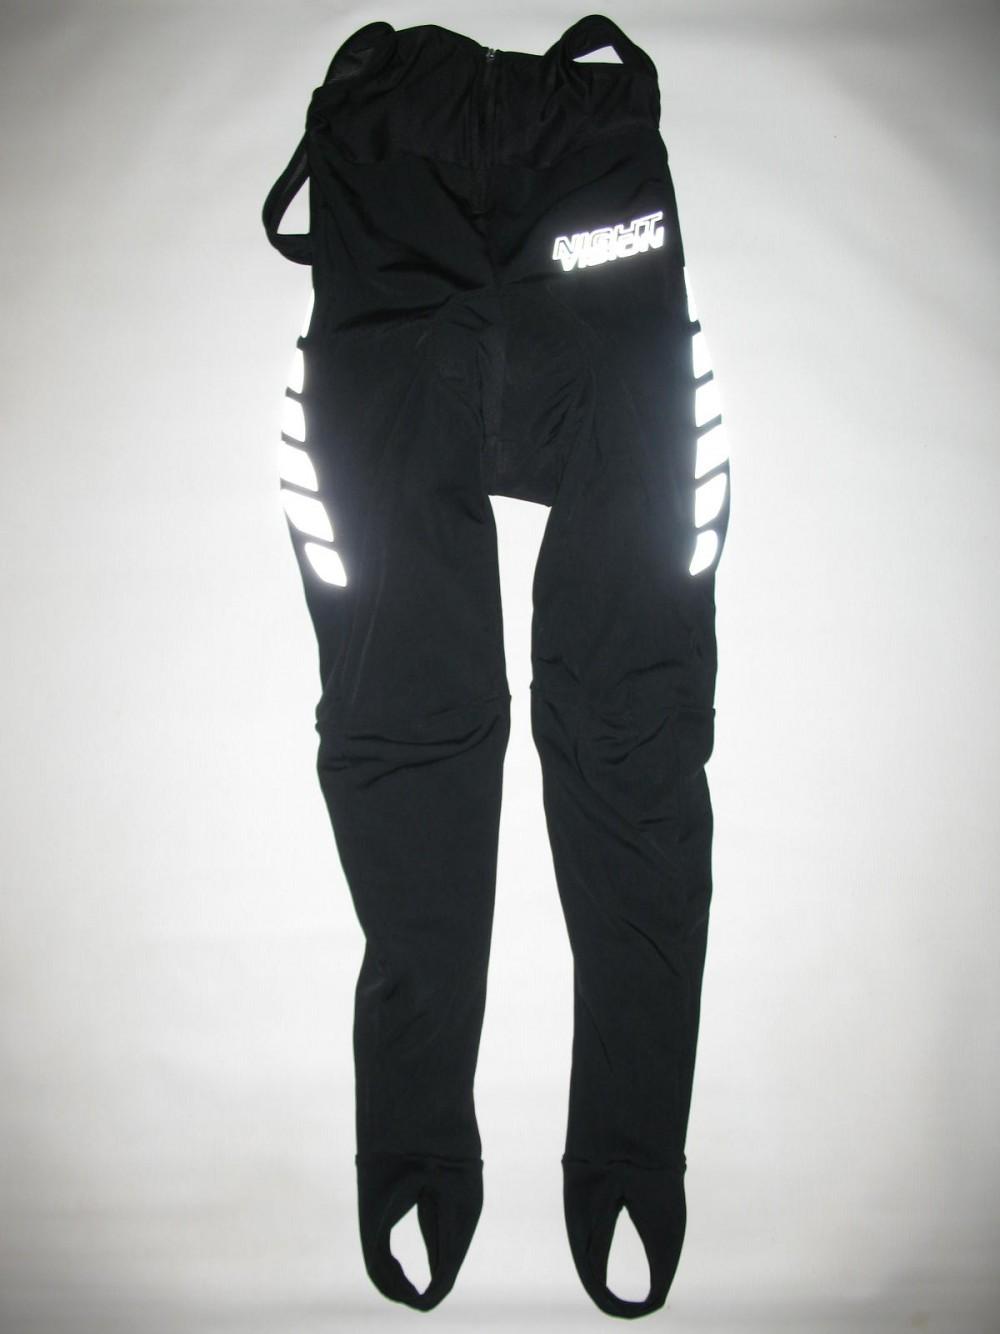 Велобрюки ALTIMA nigth vision bib cycling pants (размер L) - 1